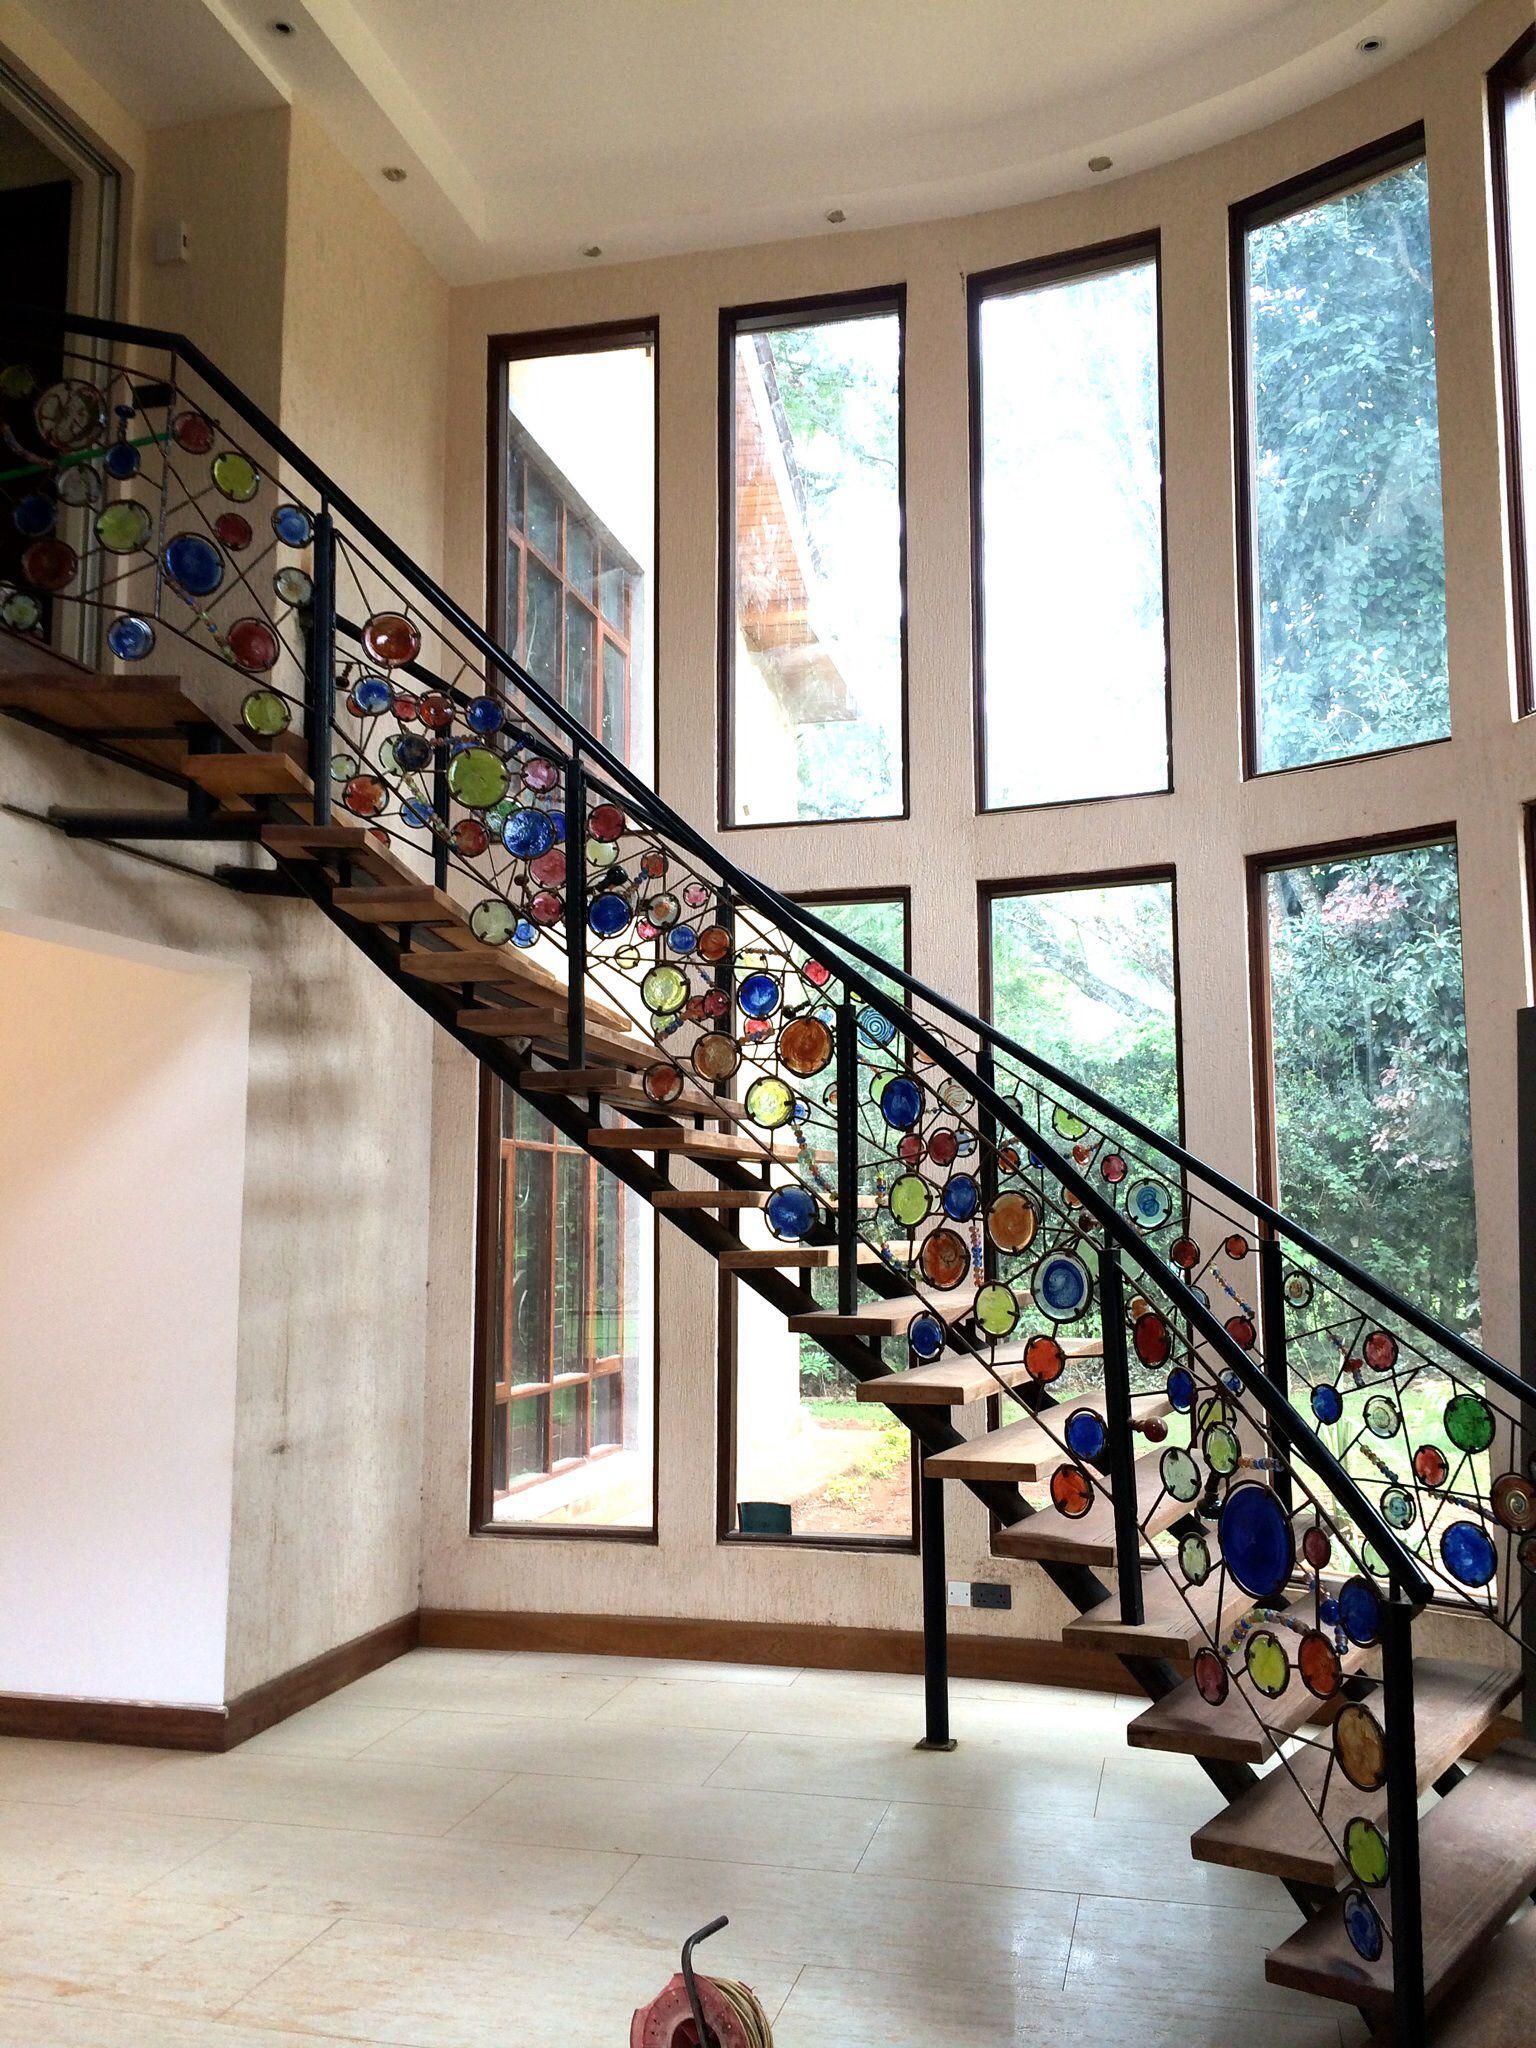 Best Kitengela Hot Glass Funky Fencing Installation In Nairobi 400 x 300